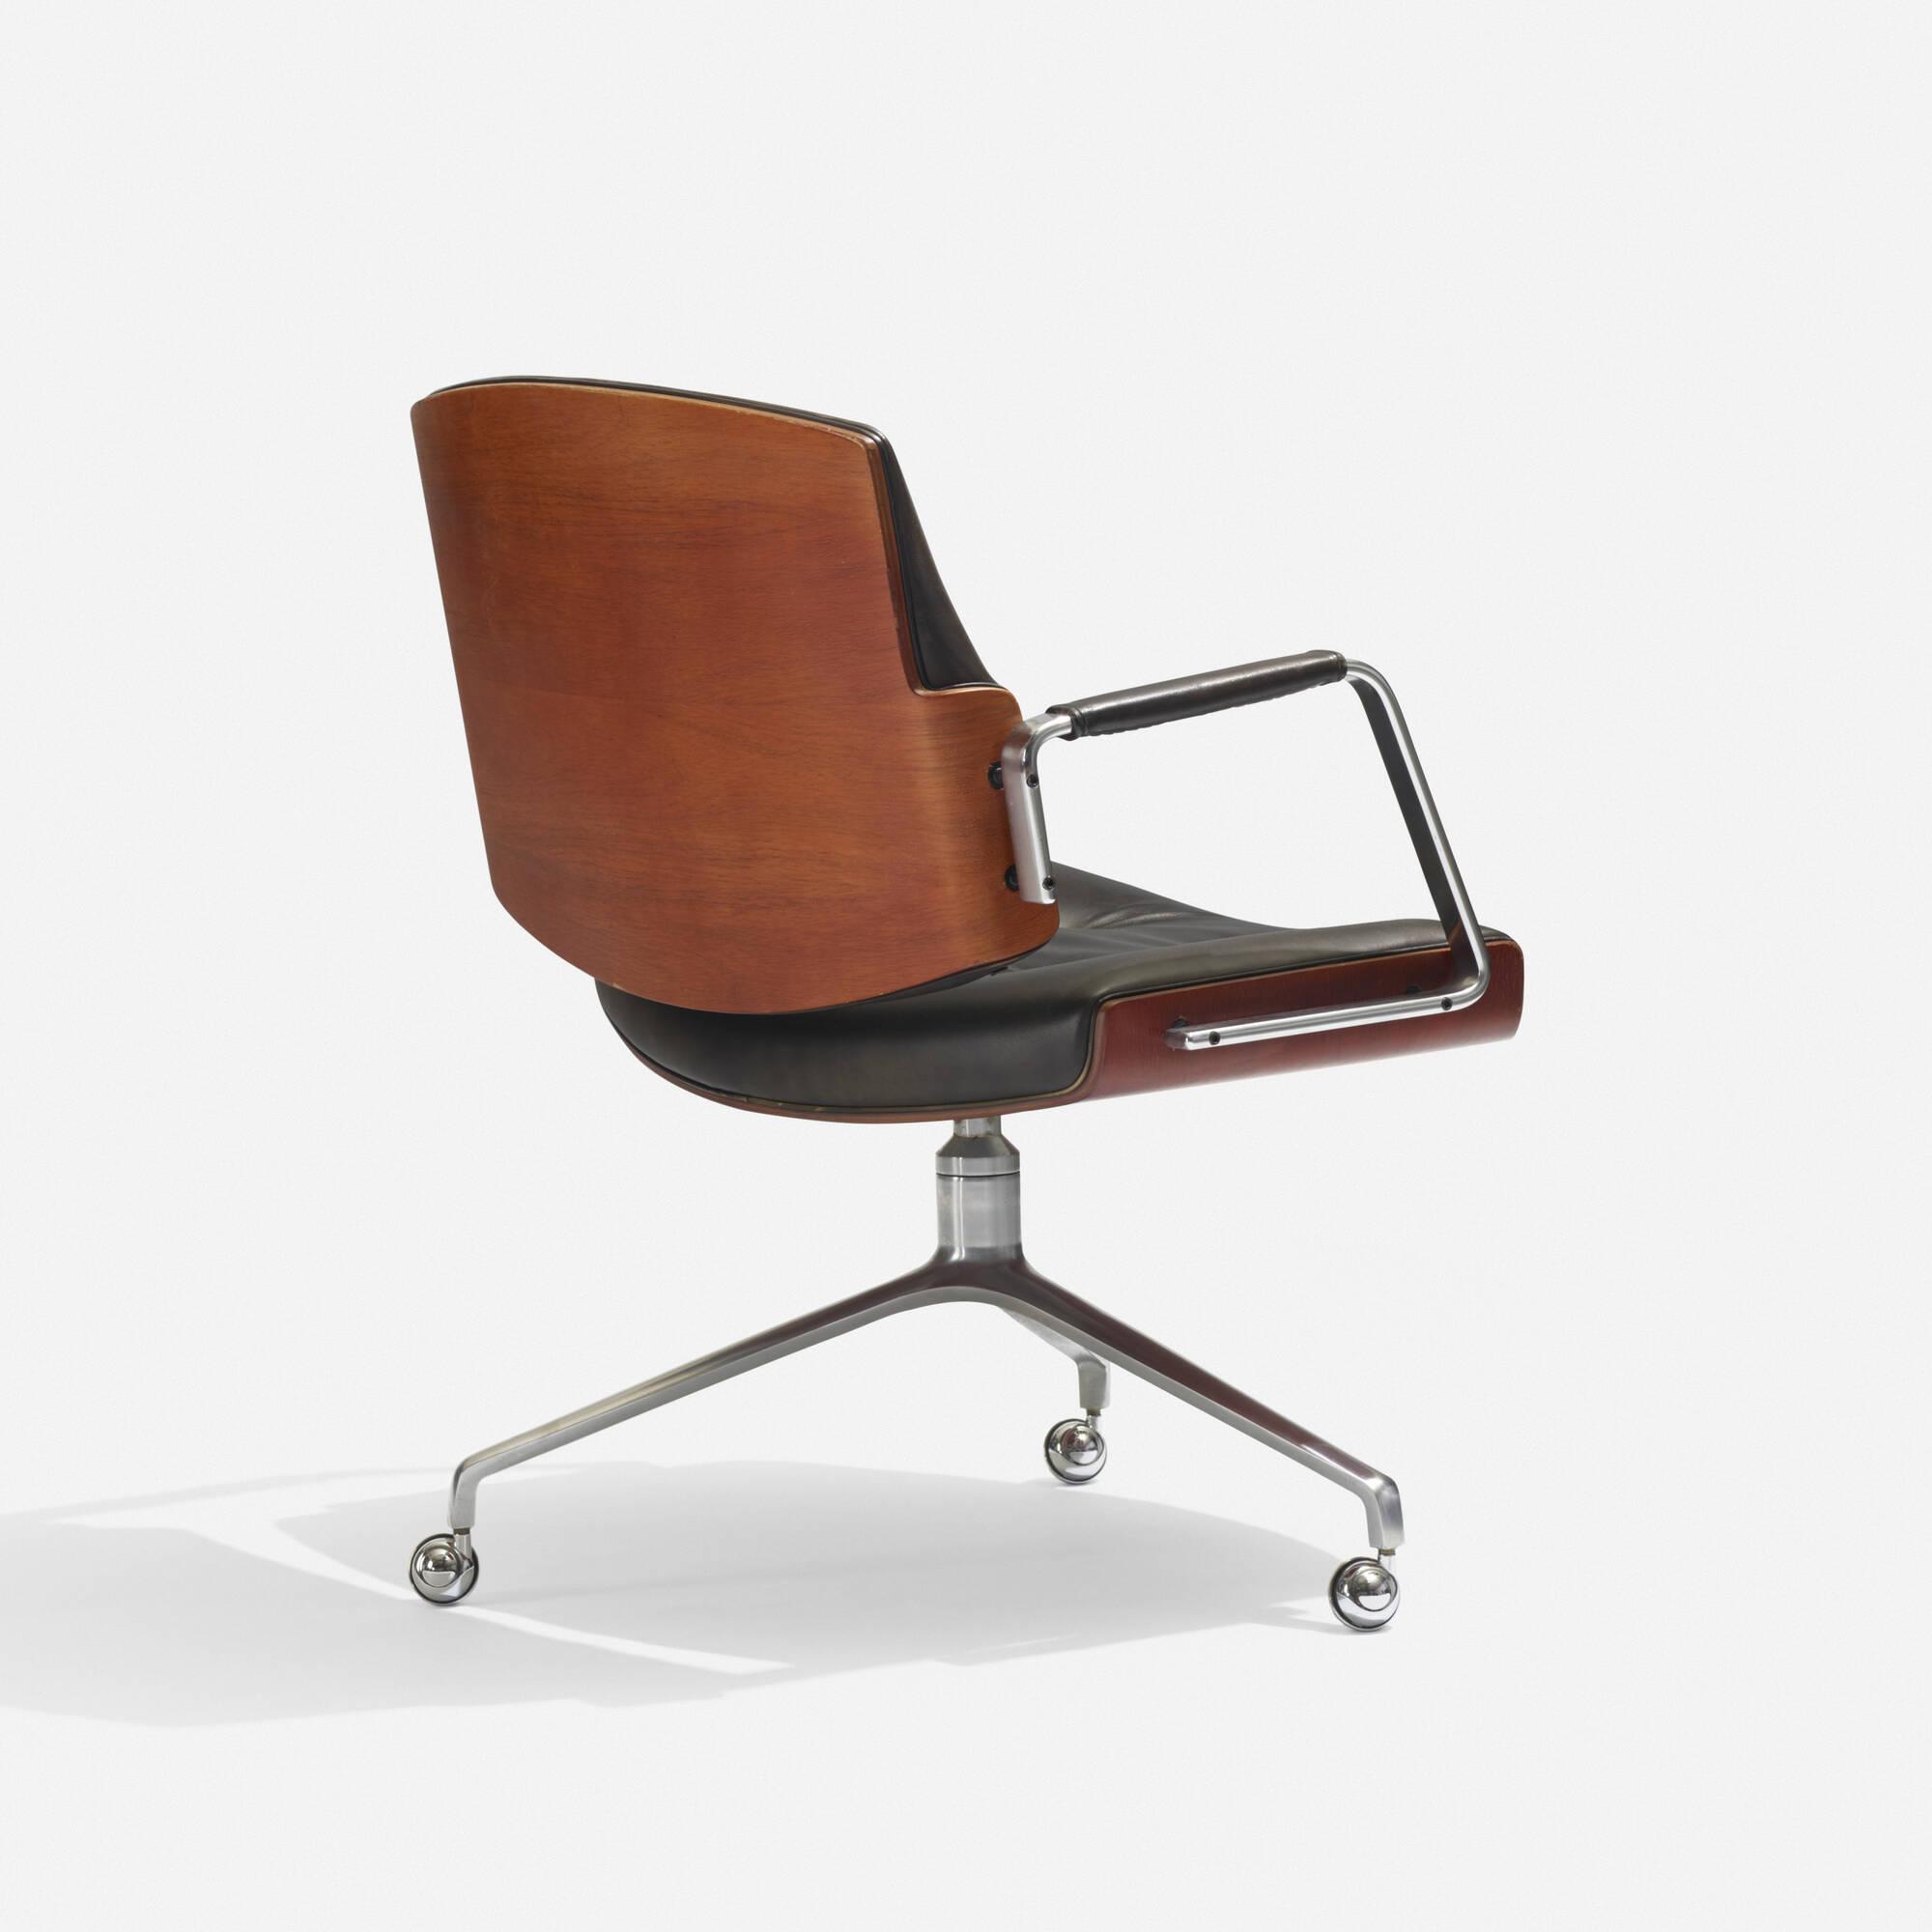 scandinavian design desk chairs desk design ideas. Black Bedroom Furniture Sets. Home Design Ideas